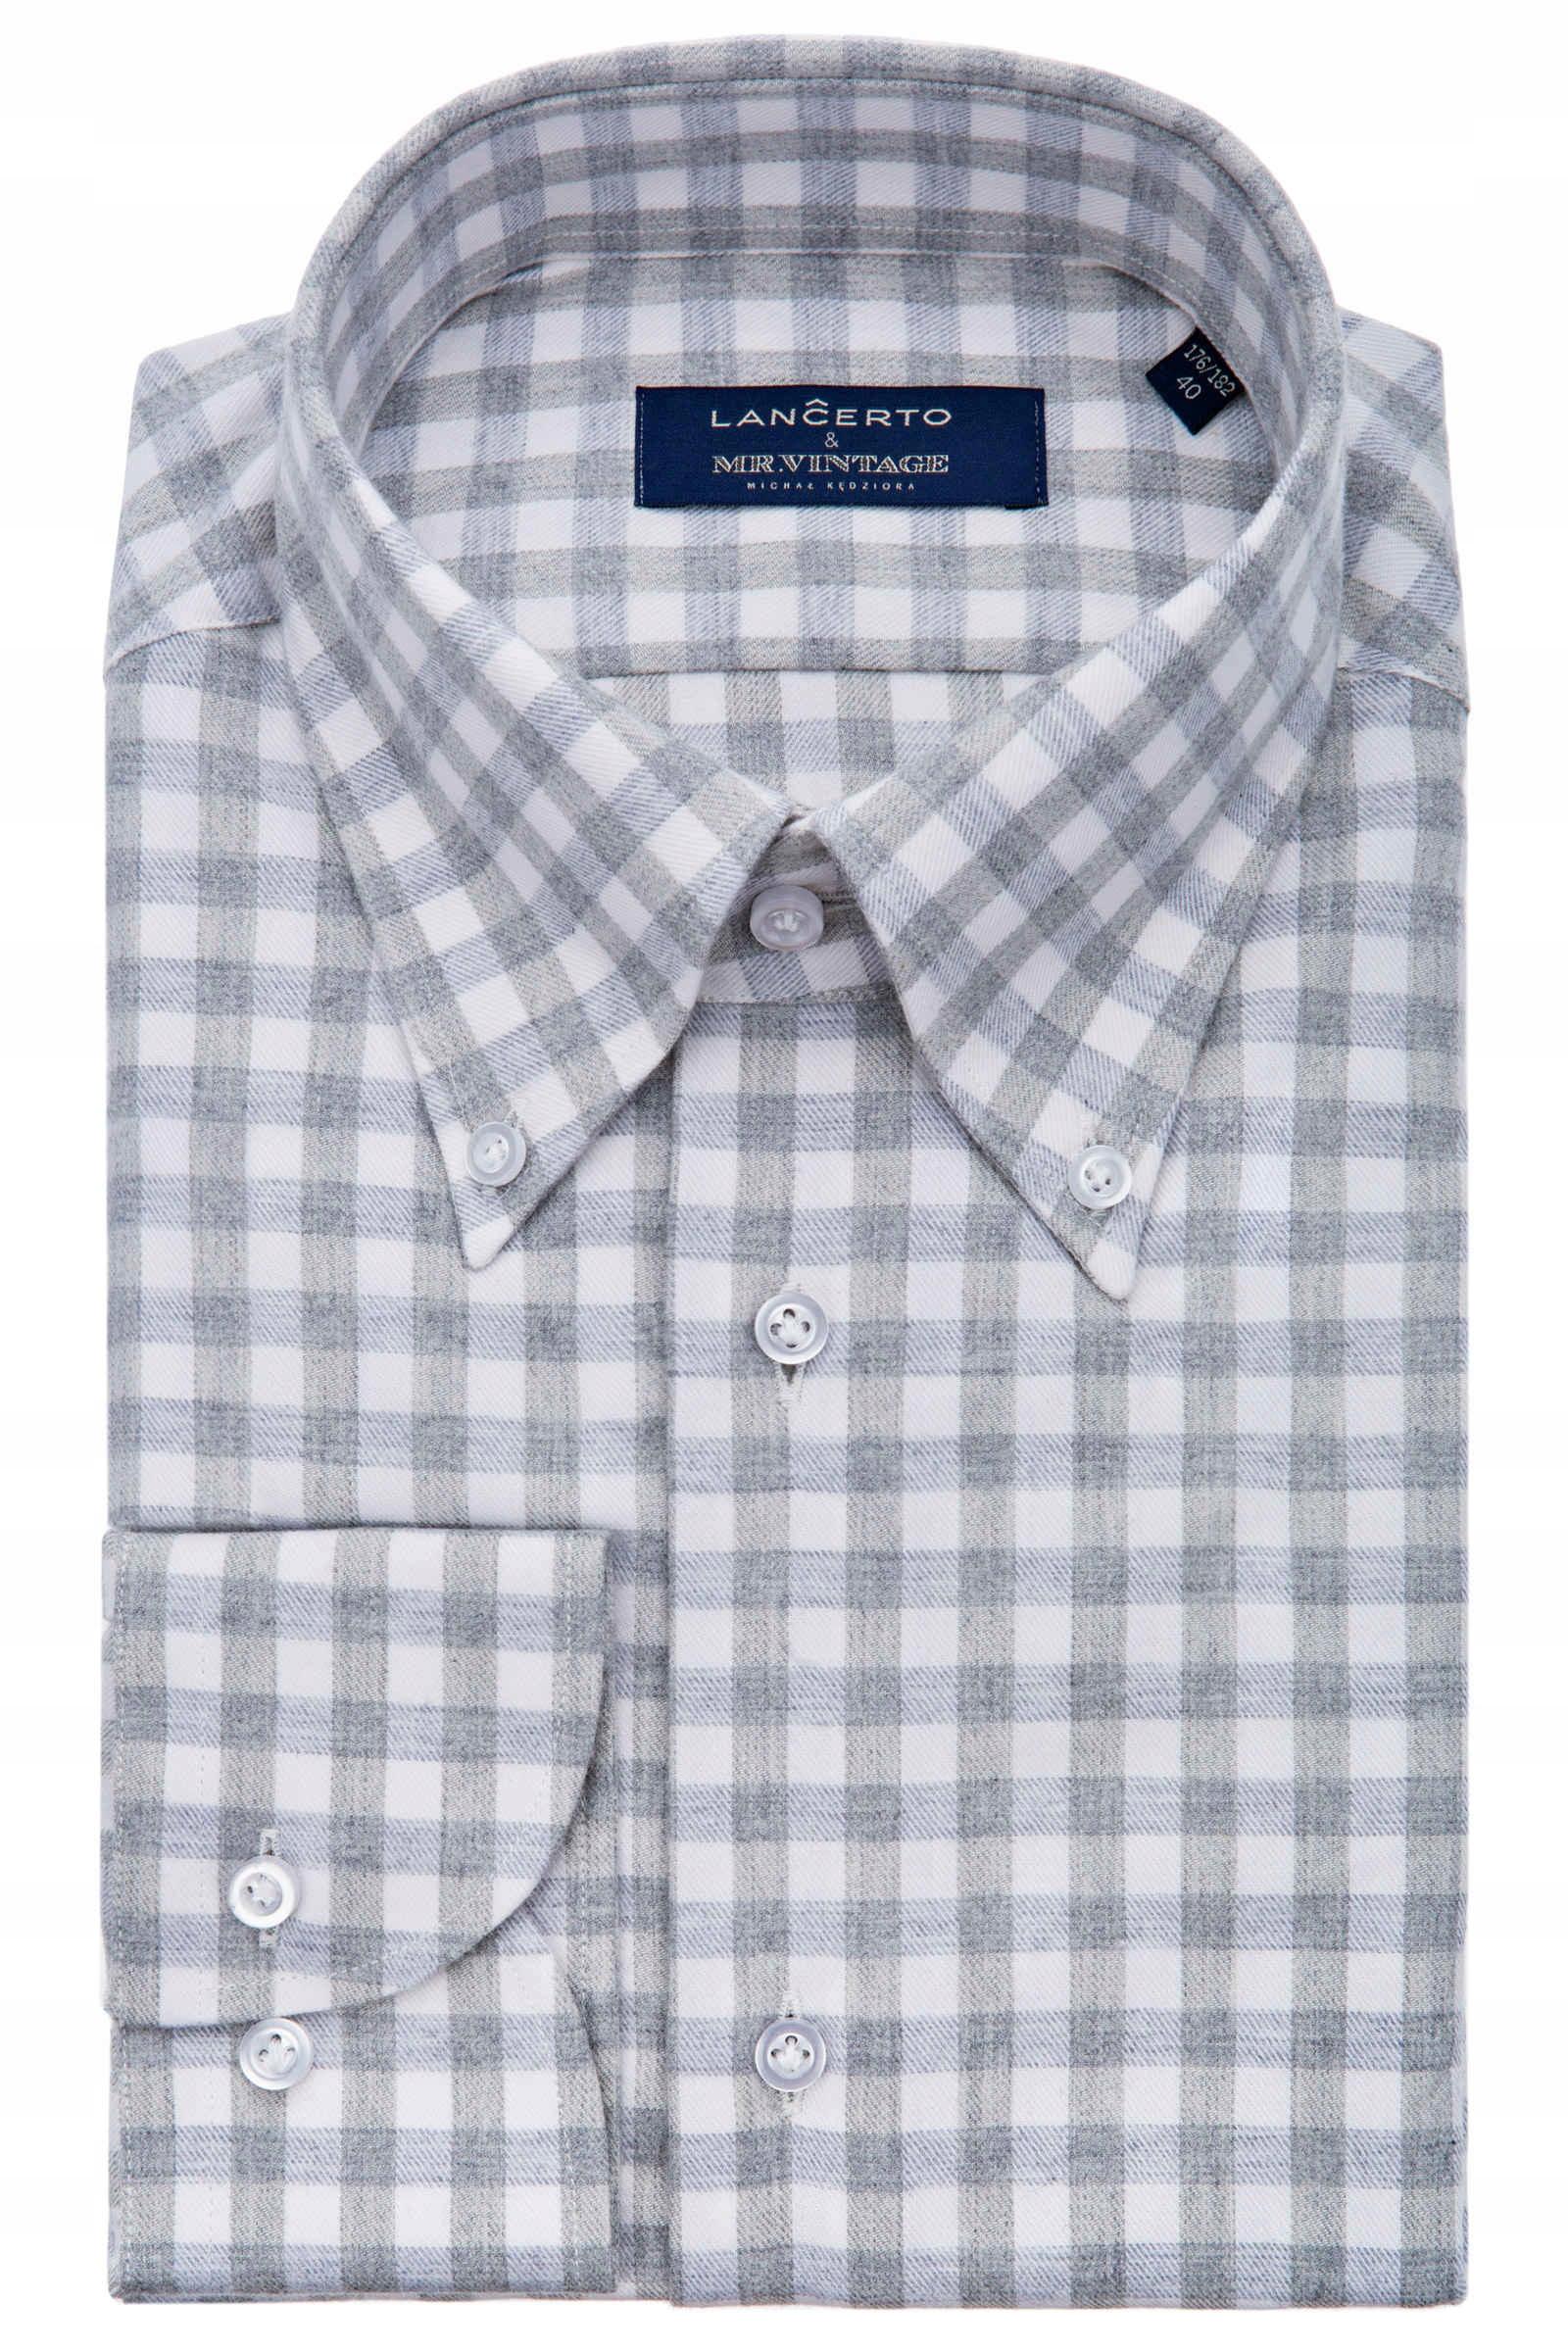 Lancerto tričko&Pán Vintage Medway 176/38